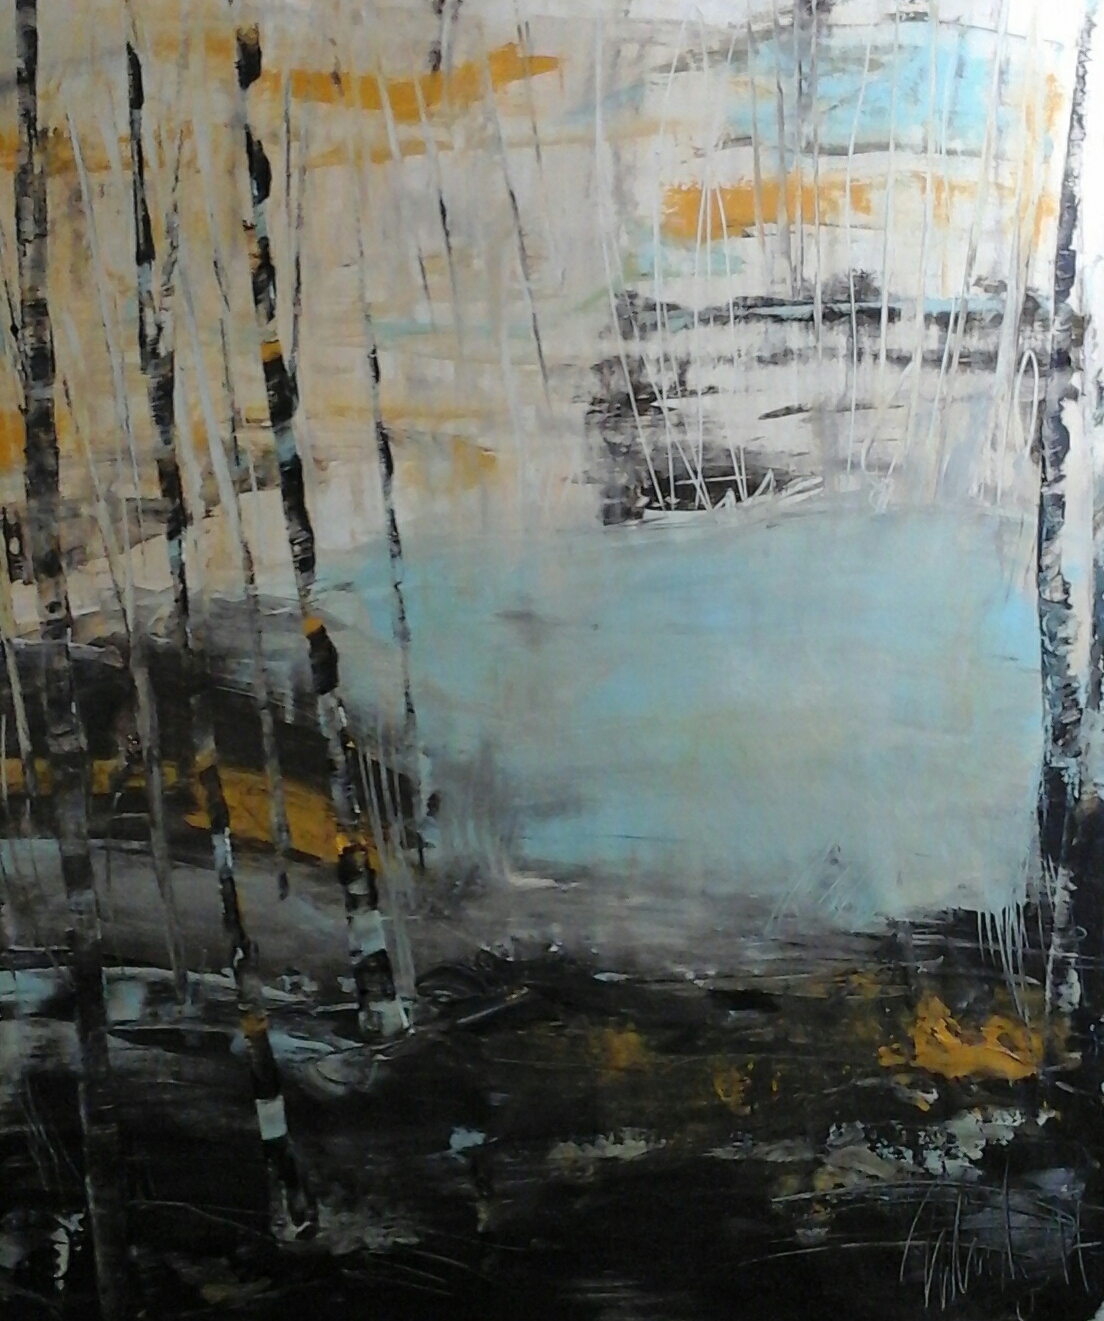 Ohne Titel, 120 x100cm Acryl auf Leinwand